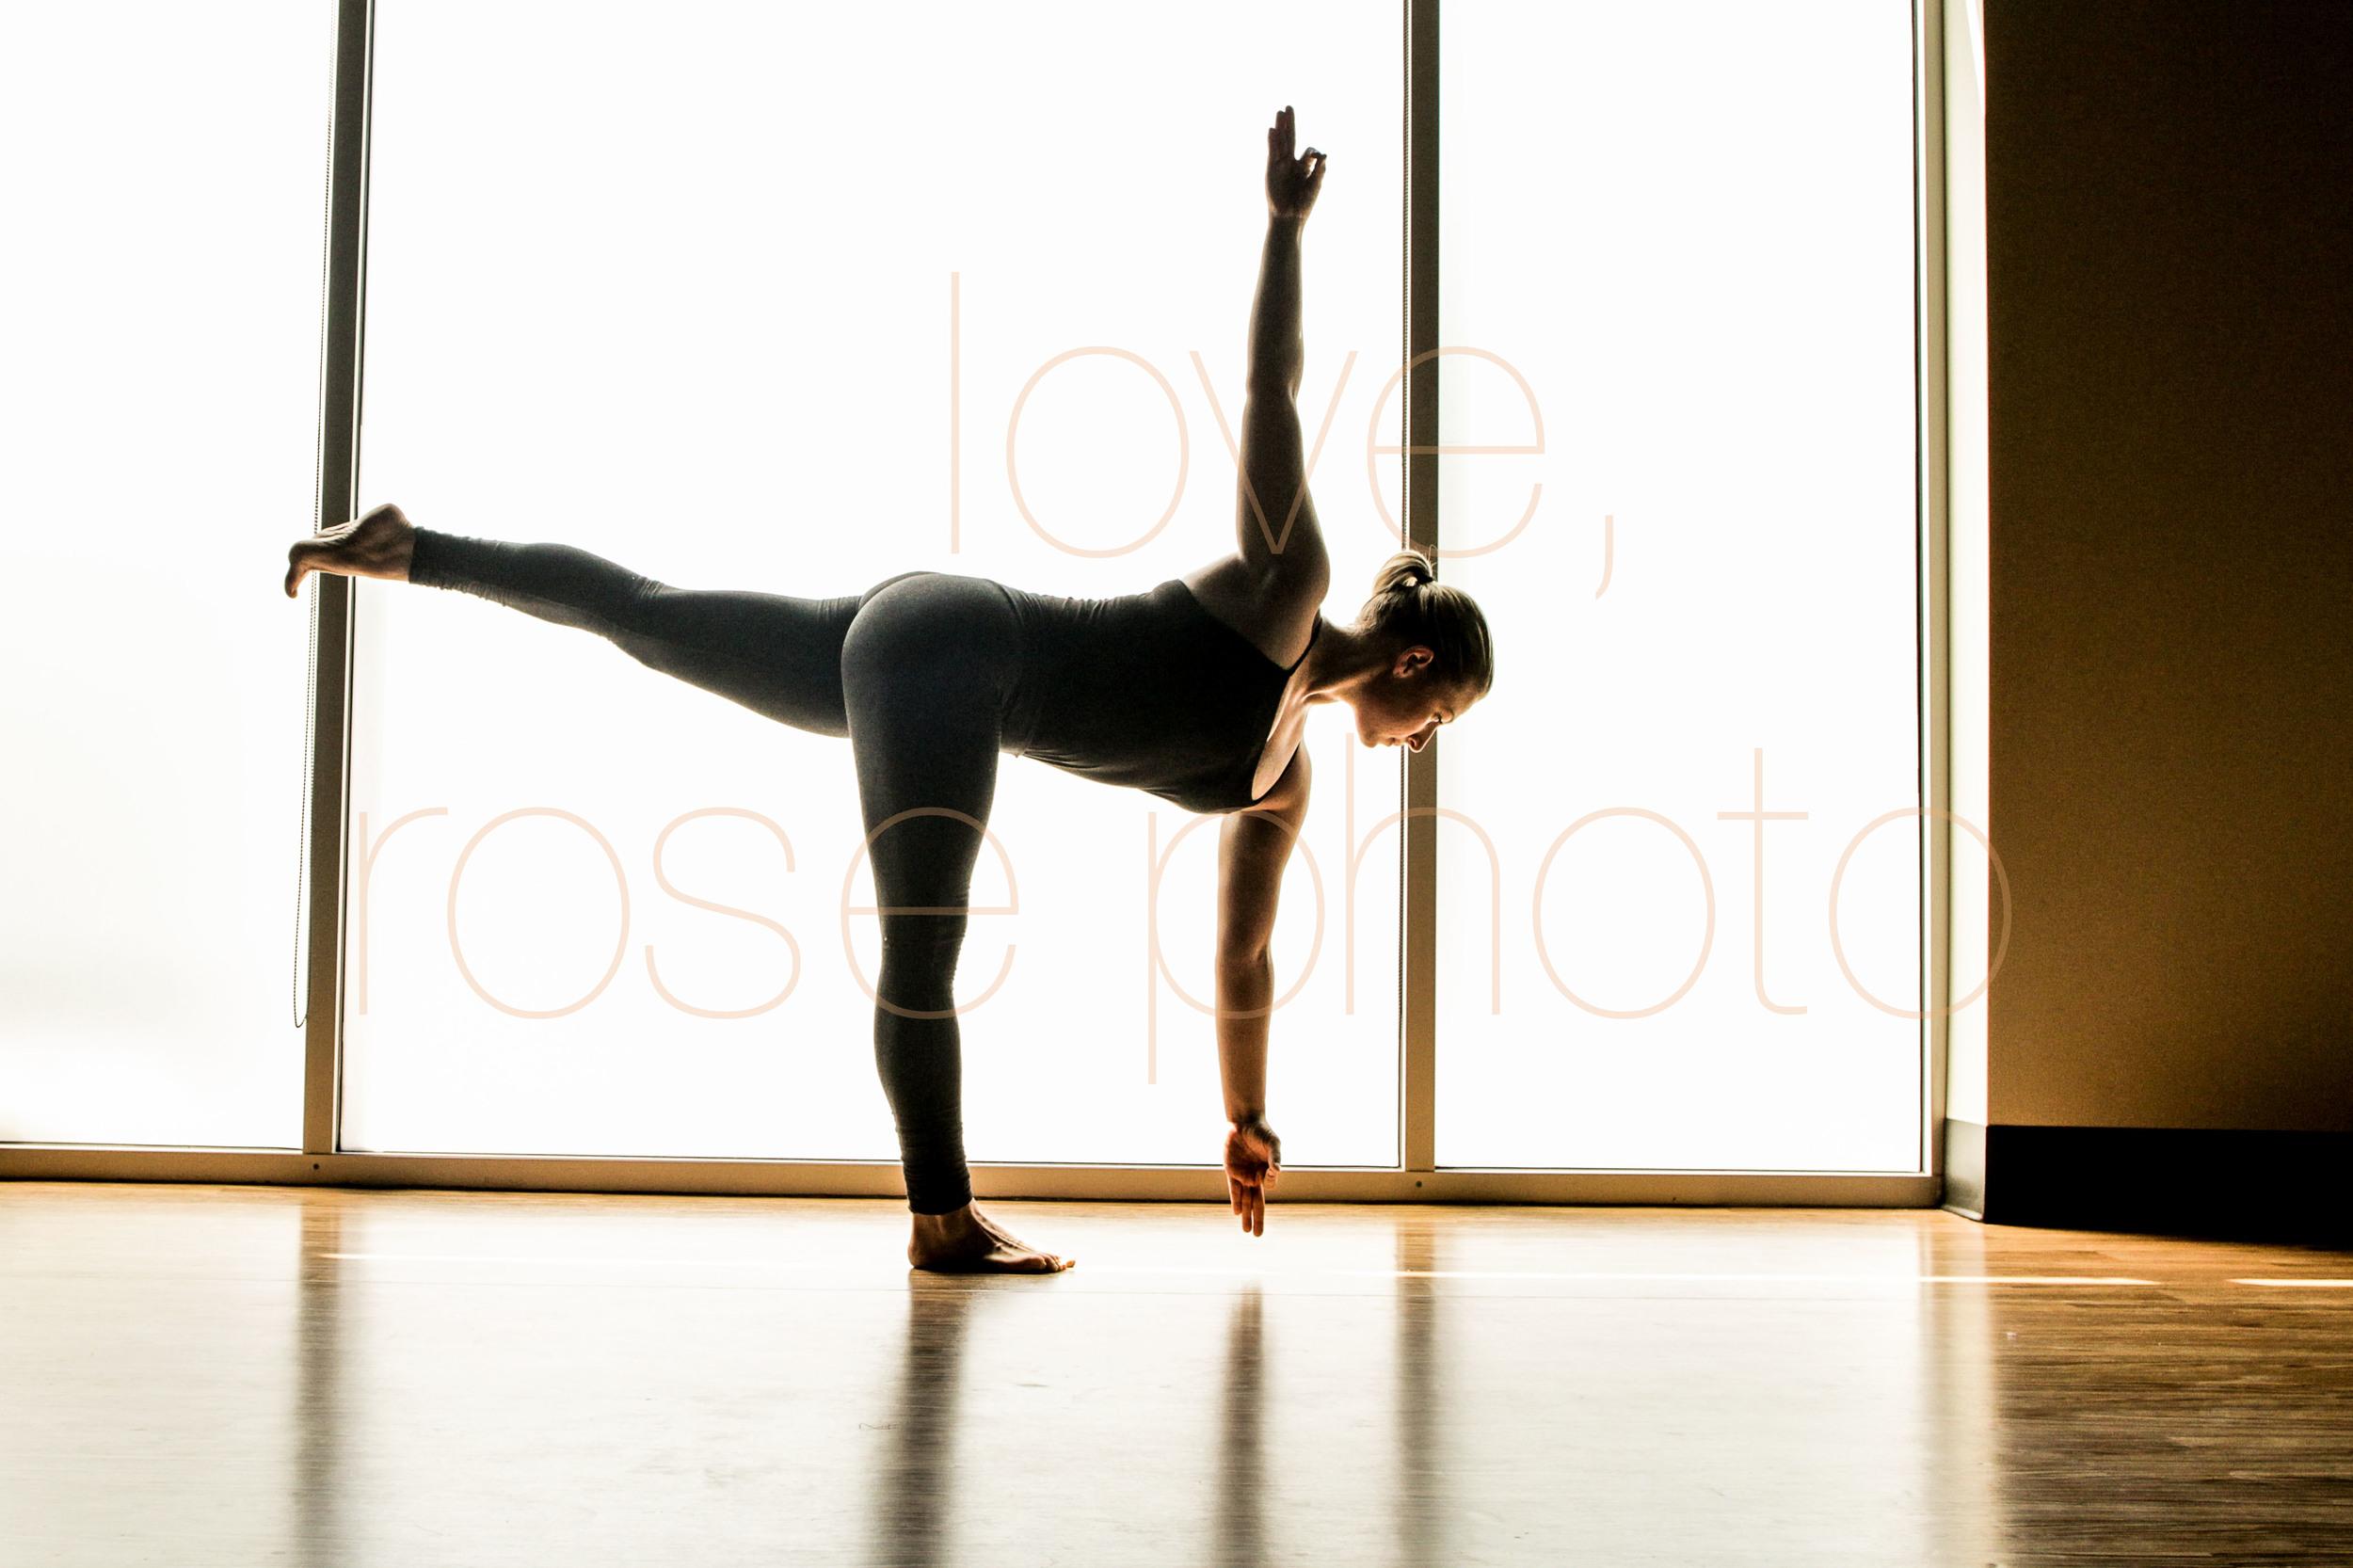 Bridget Skaggs yoga instructor Core Power Yoga Chicago West Loop power vinyasa flow yoga-5.jpg